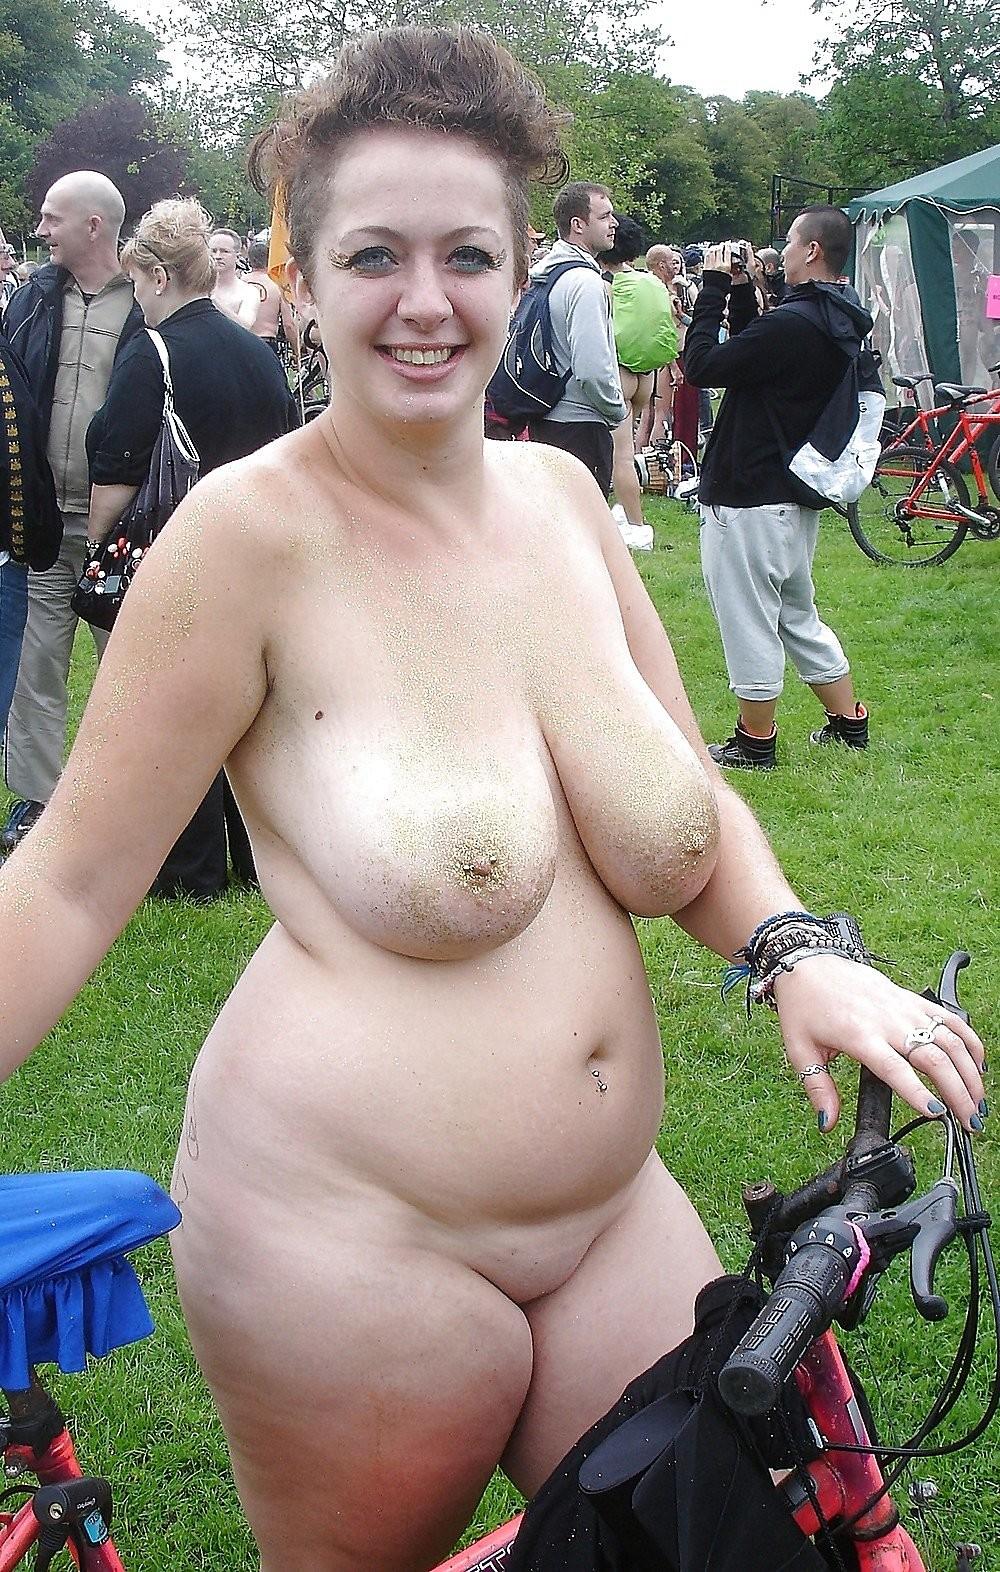 vagina-slips-thick-nude-redneck-women-granny-live-online